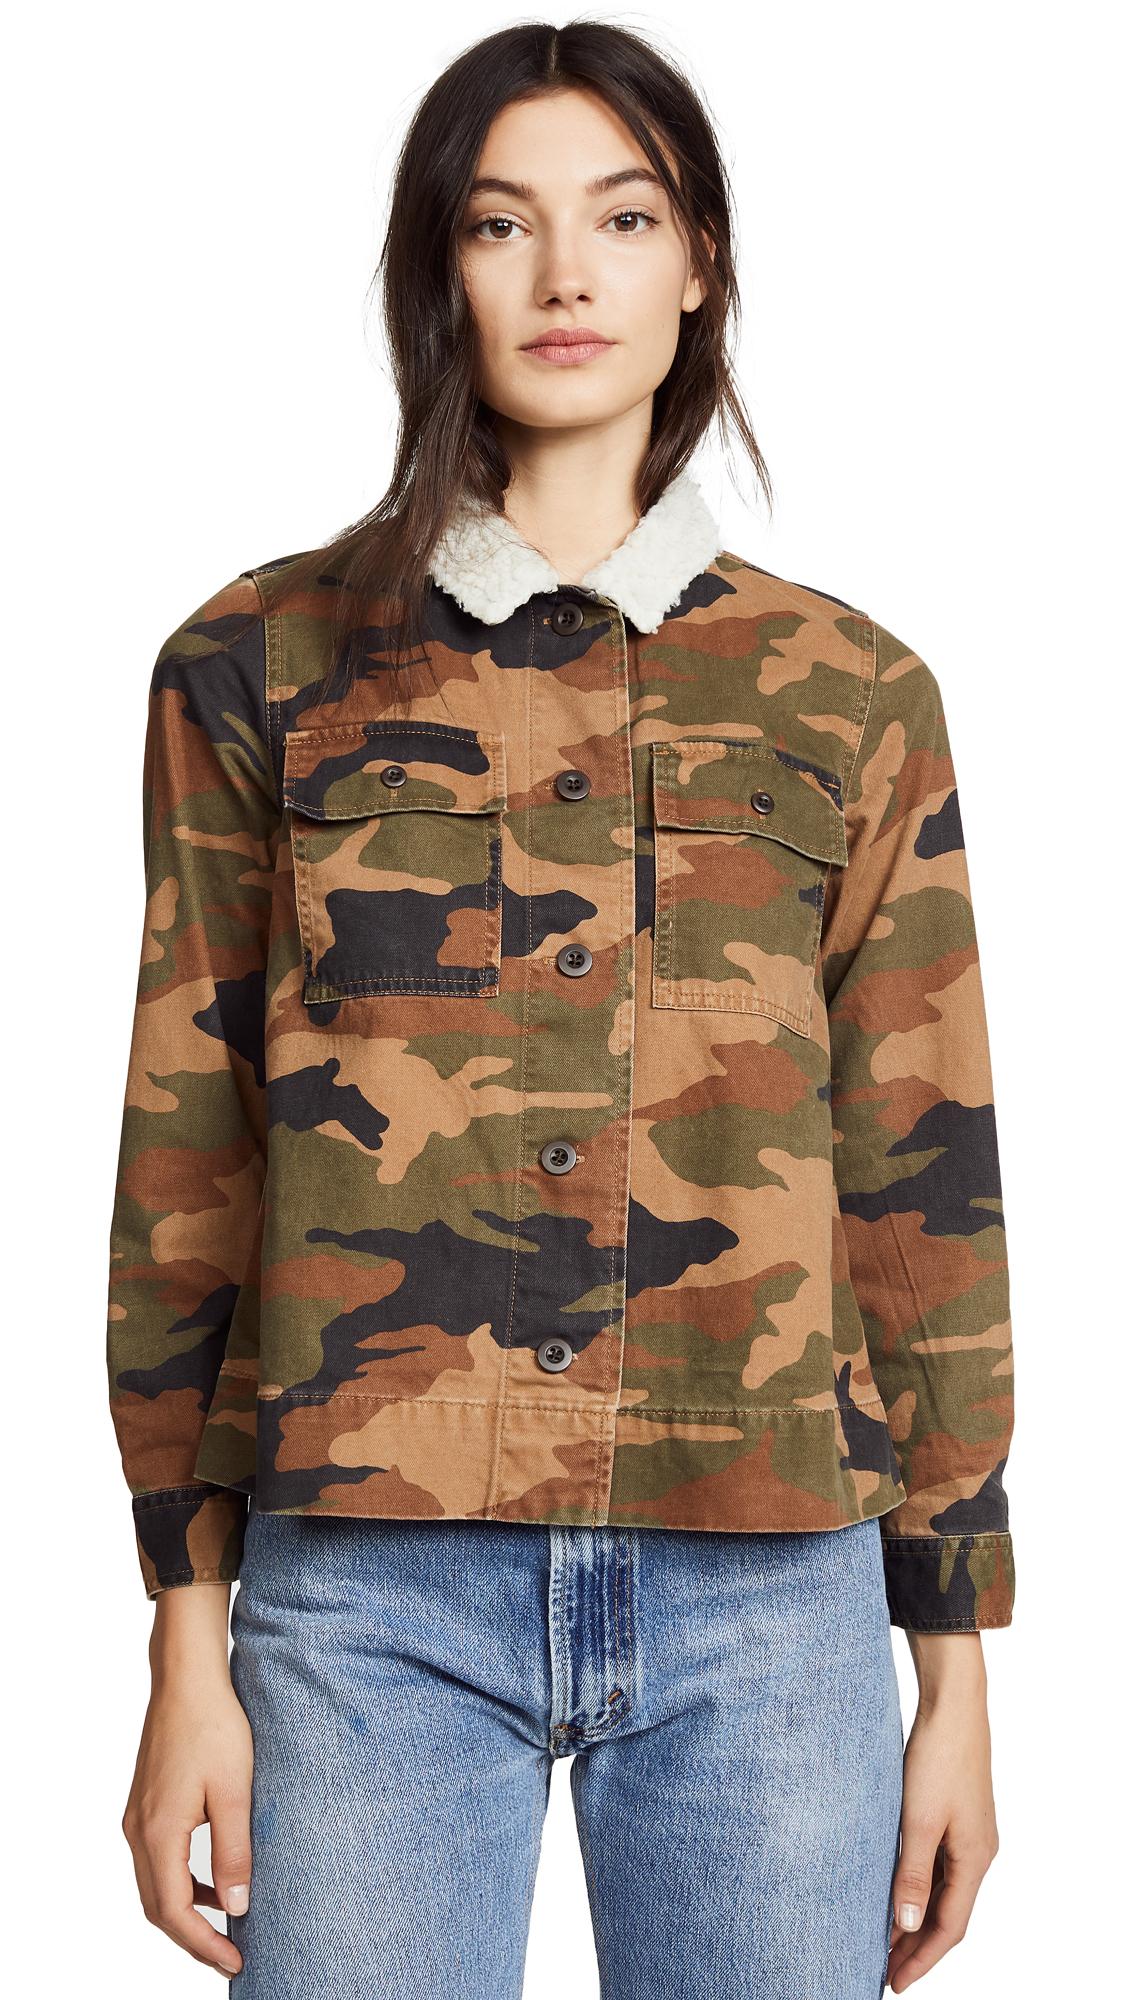 Madewell Northward Camo Army Jacket In Bunny Camo